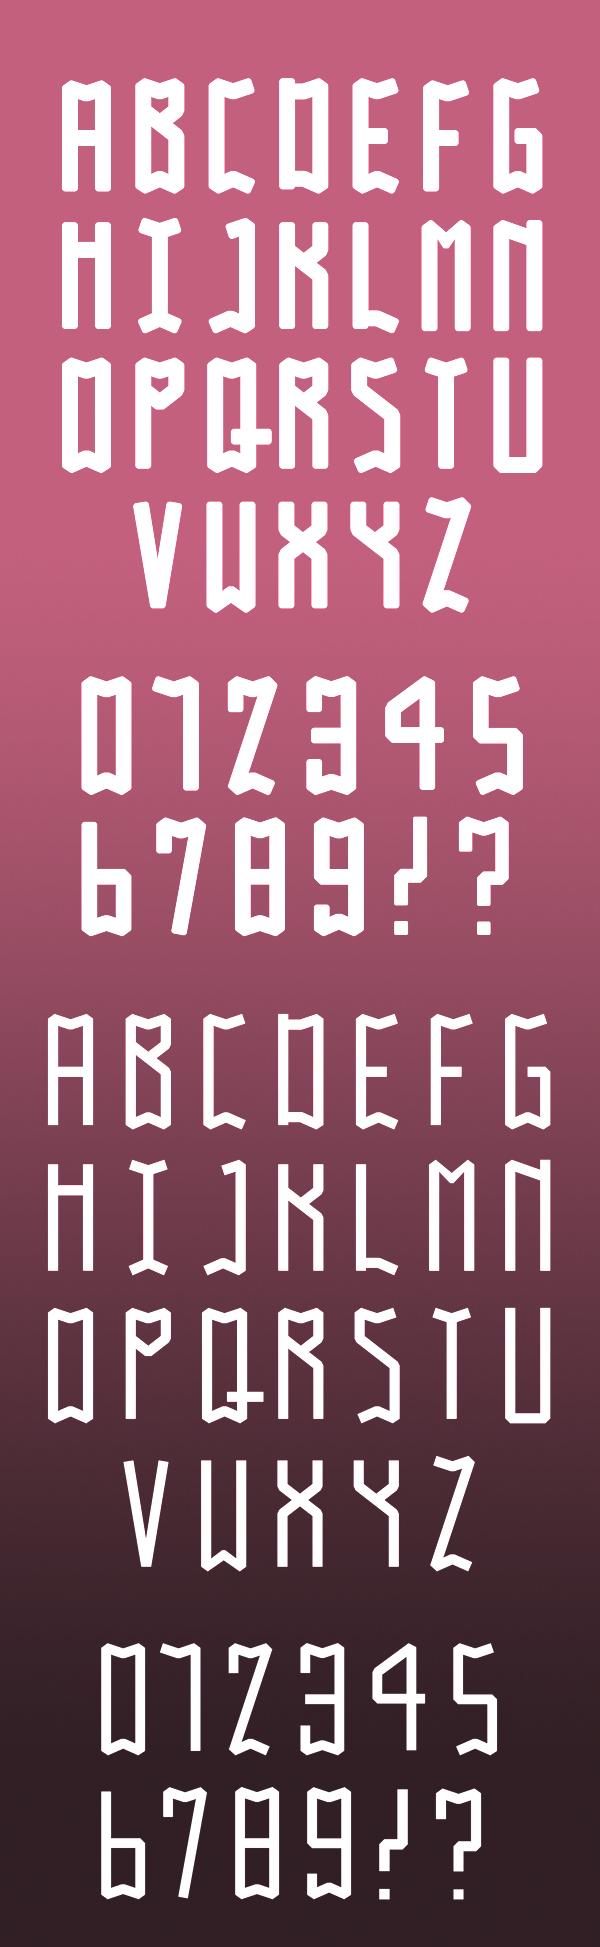 Gabo font letters | Free Fonts | Pinterest | Fonts, Free fonts for